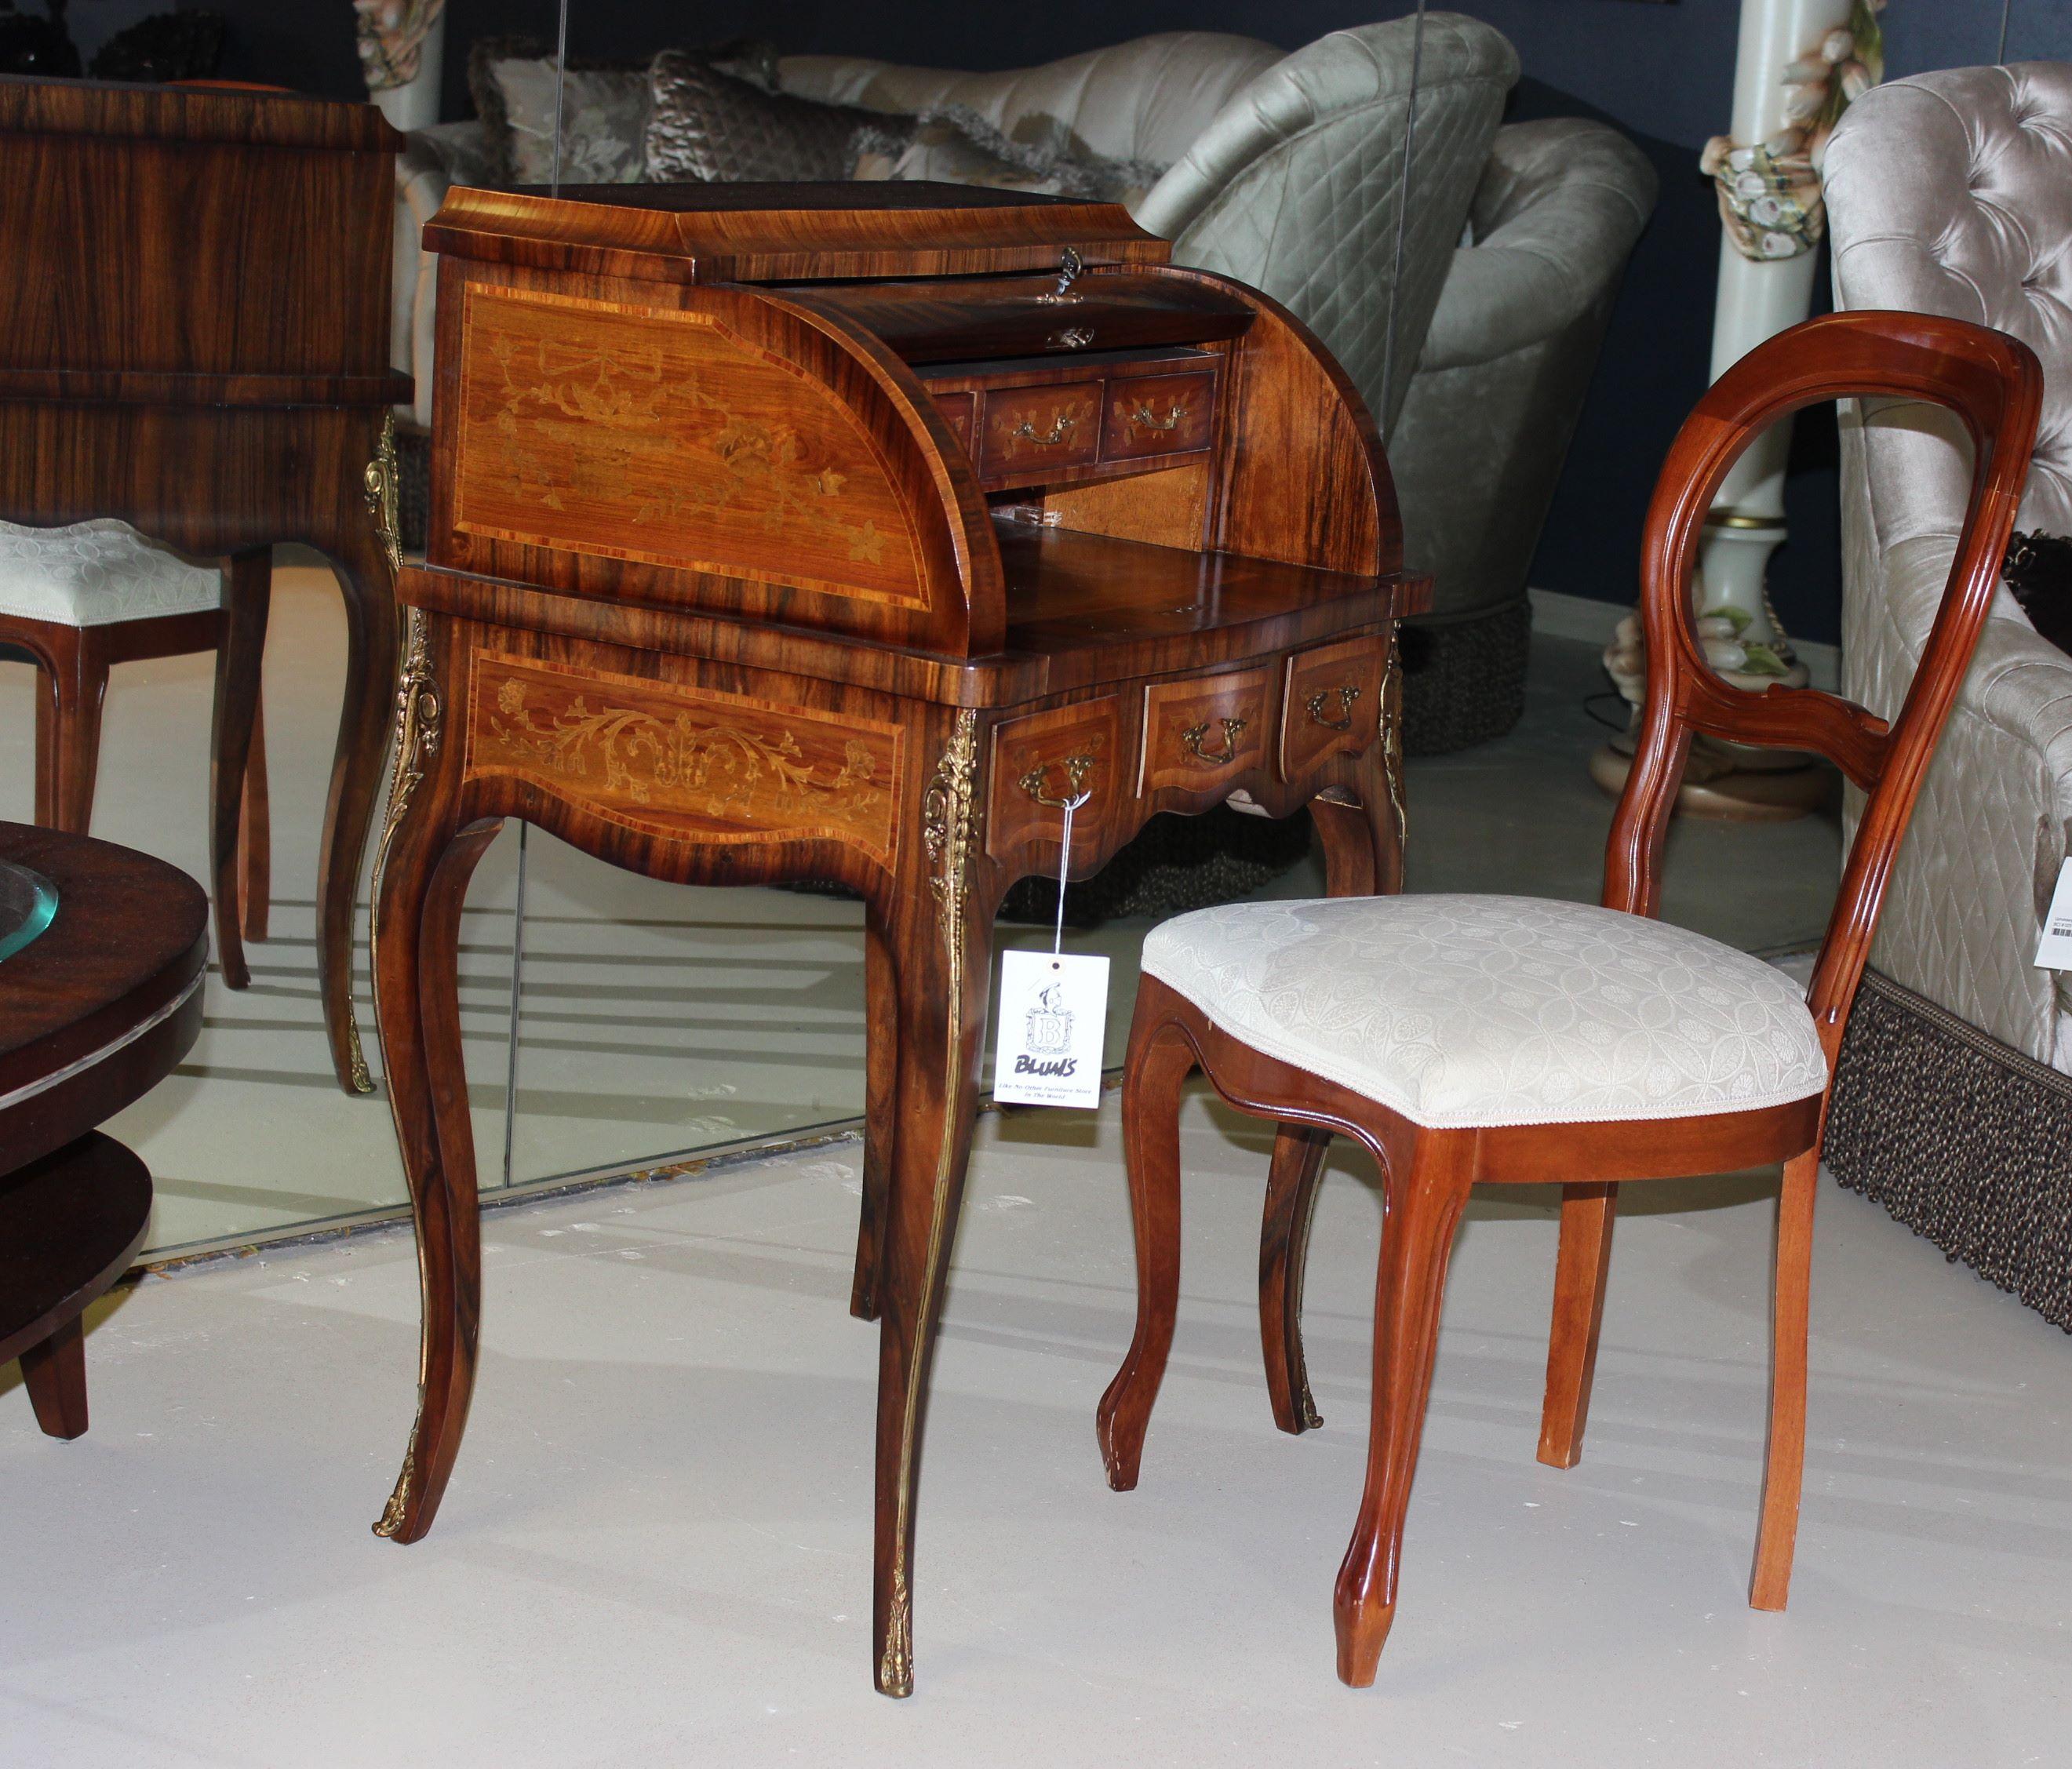 Bon Blumu0027s Furniture Co. U2013 5927 Westheimer, Houston, Texas 77057 U2022 713 783 1500  U2022 By Appointment Only